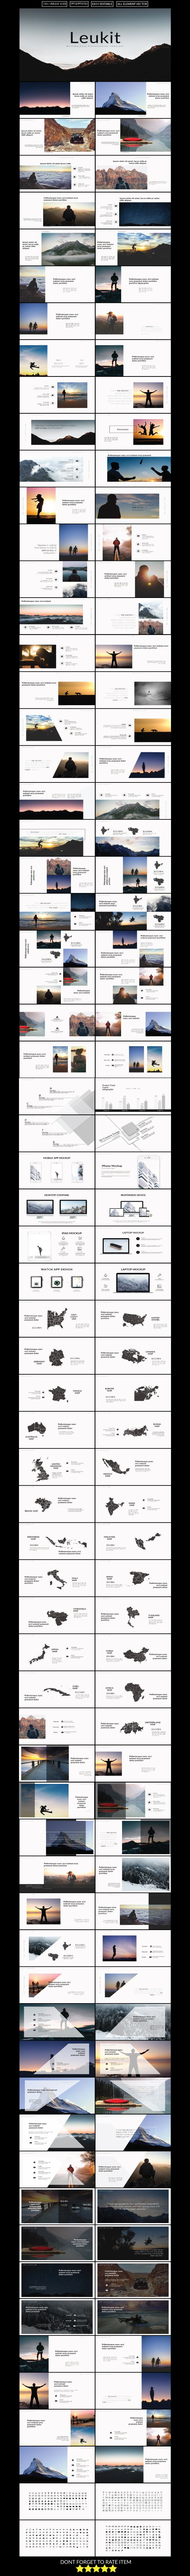 Leukit Mdrn Powerpoint Presentation Template